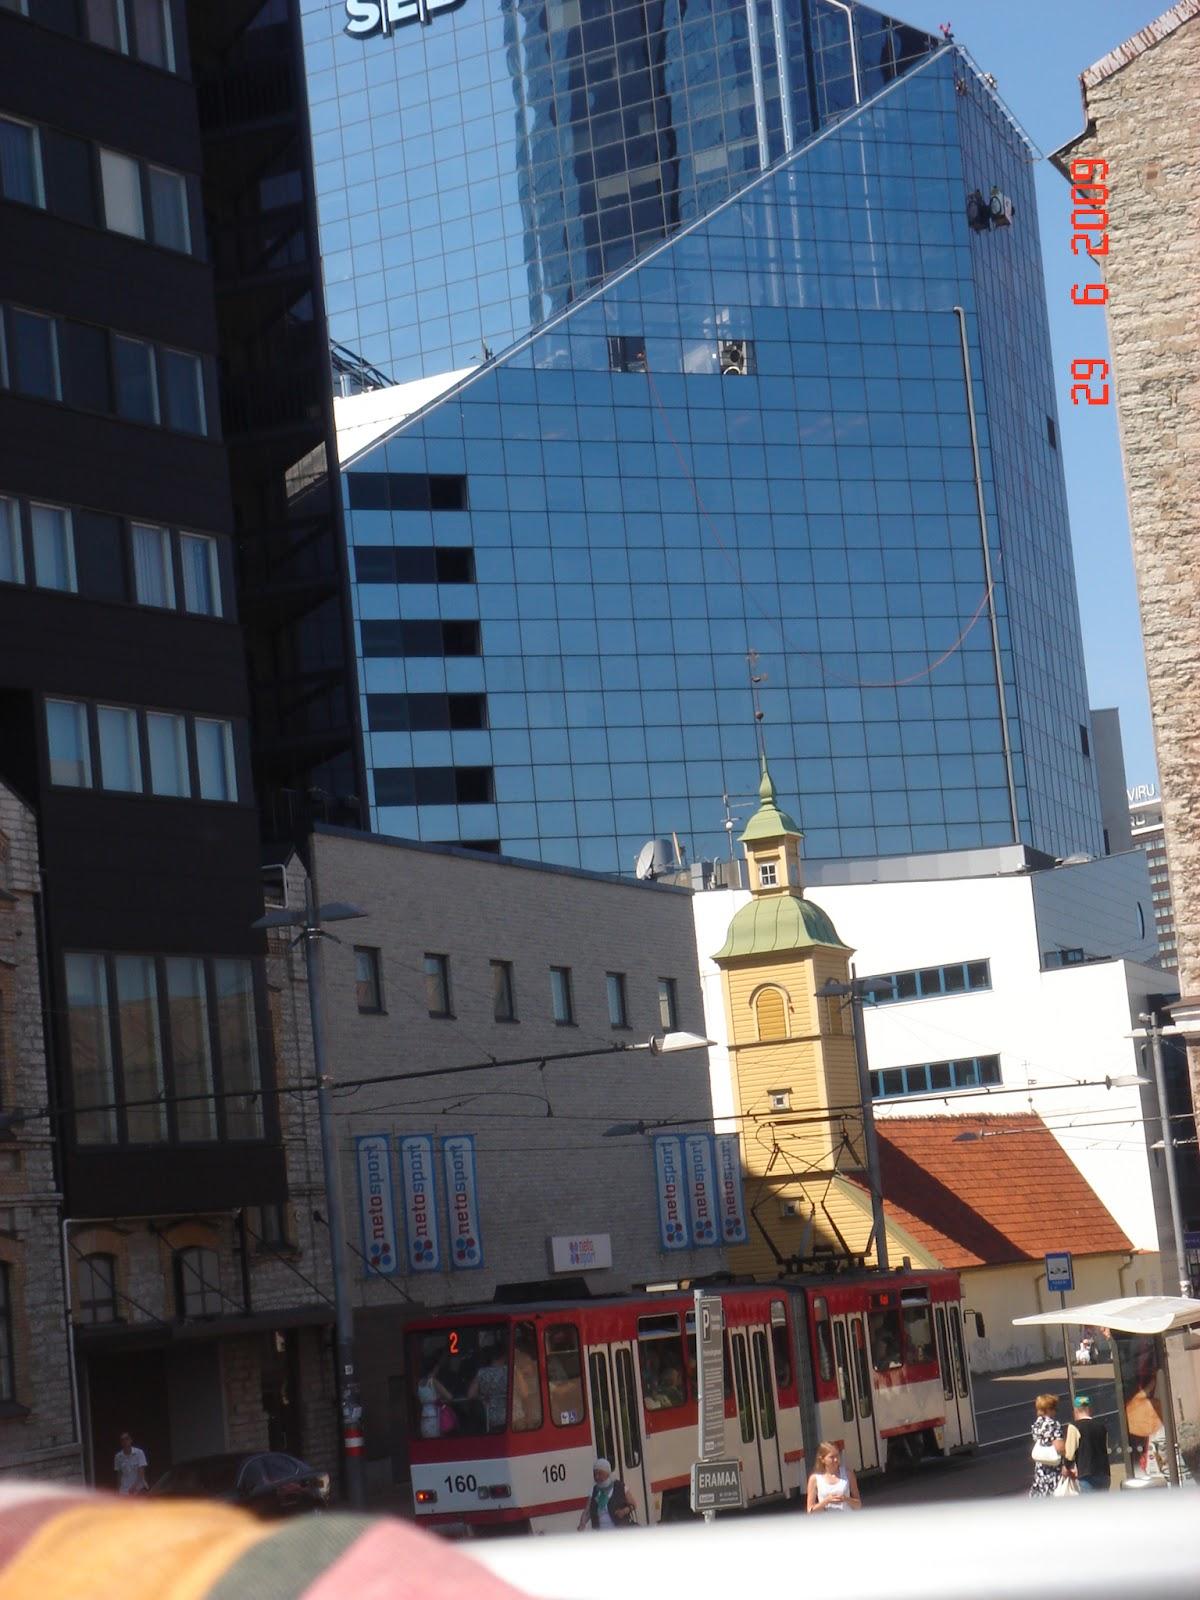 Sights of Tallinn City